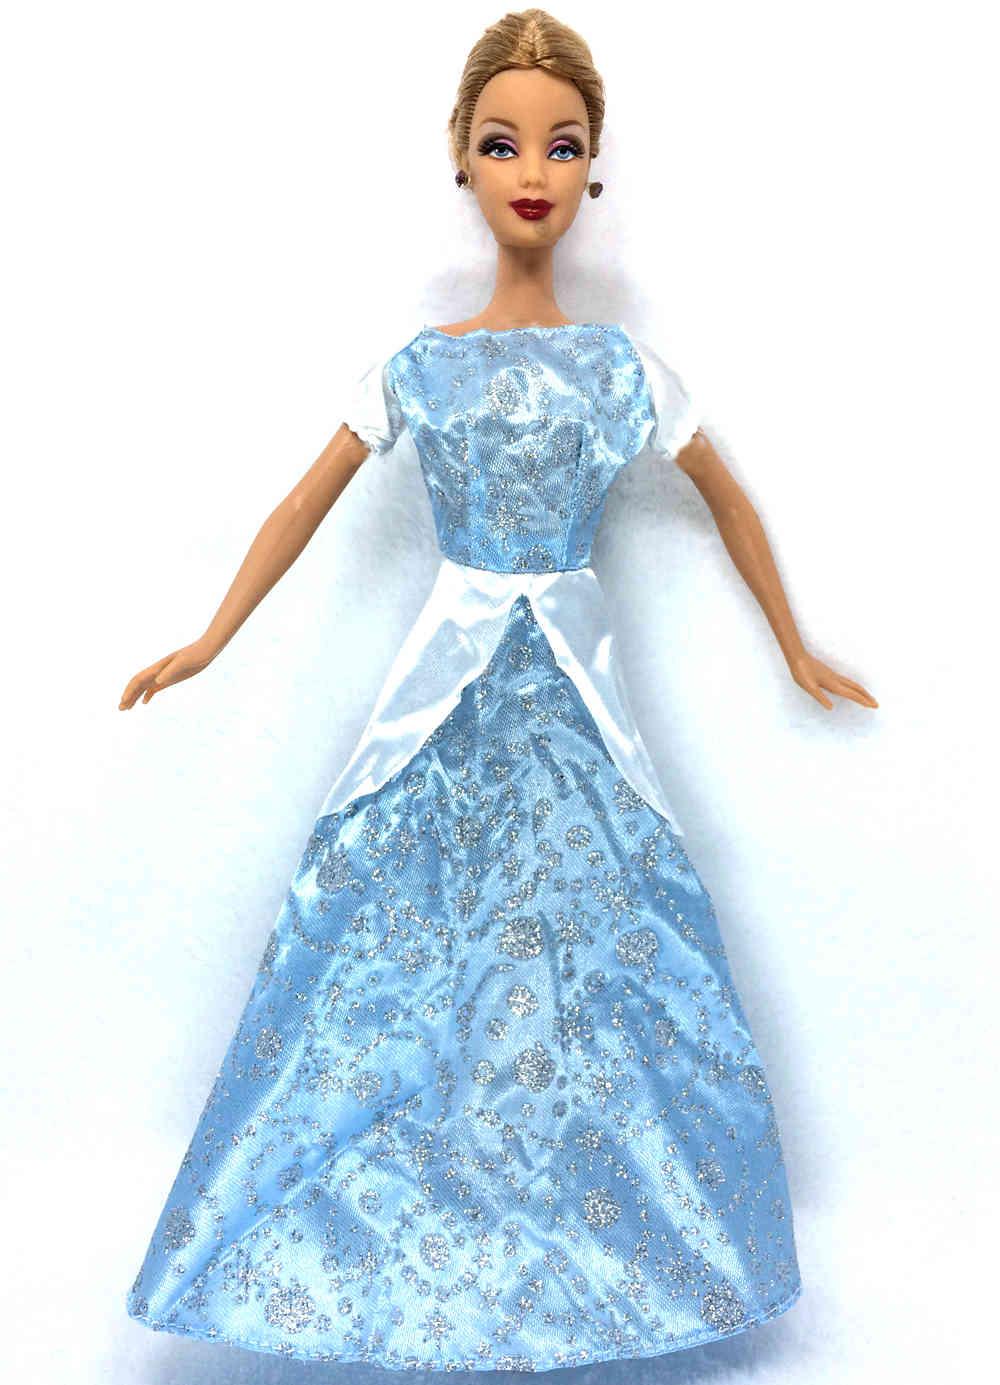 Robe barbie blanche neige